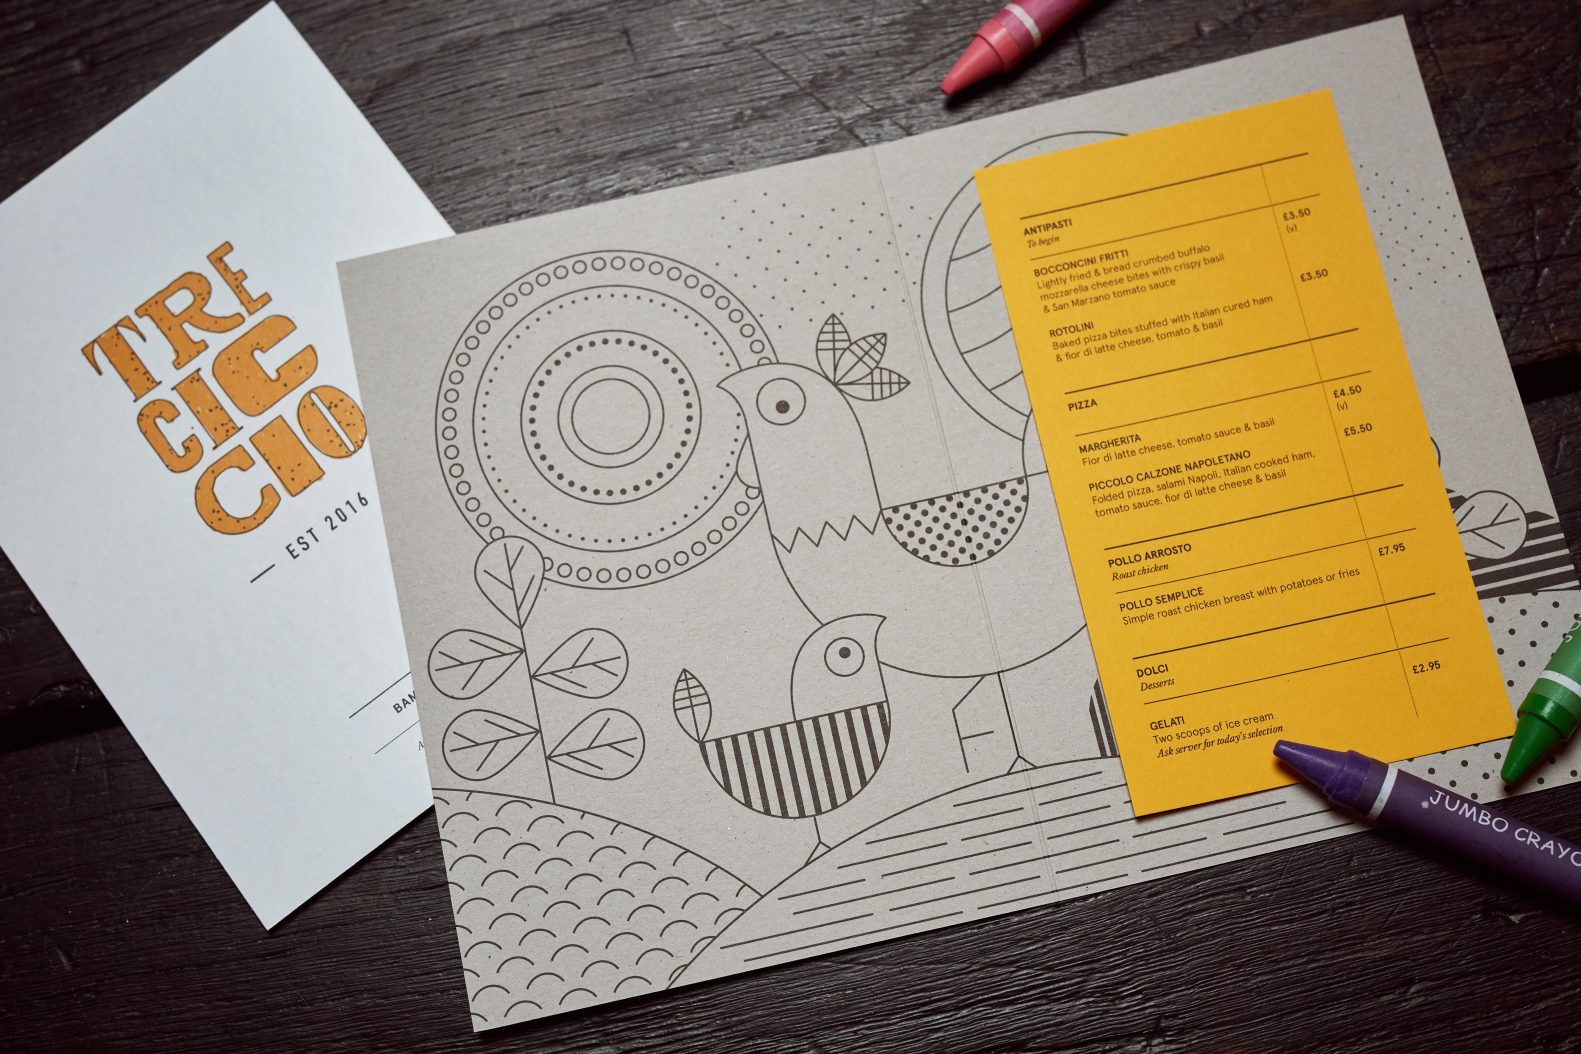 Tre Ciccio Menu Branding and Illustration